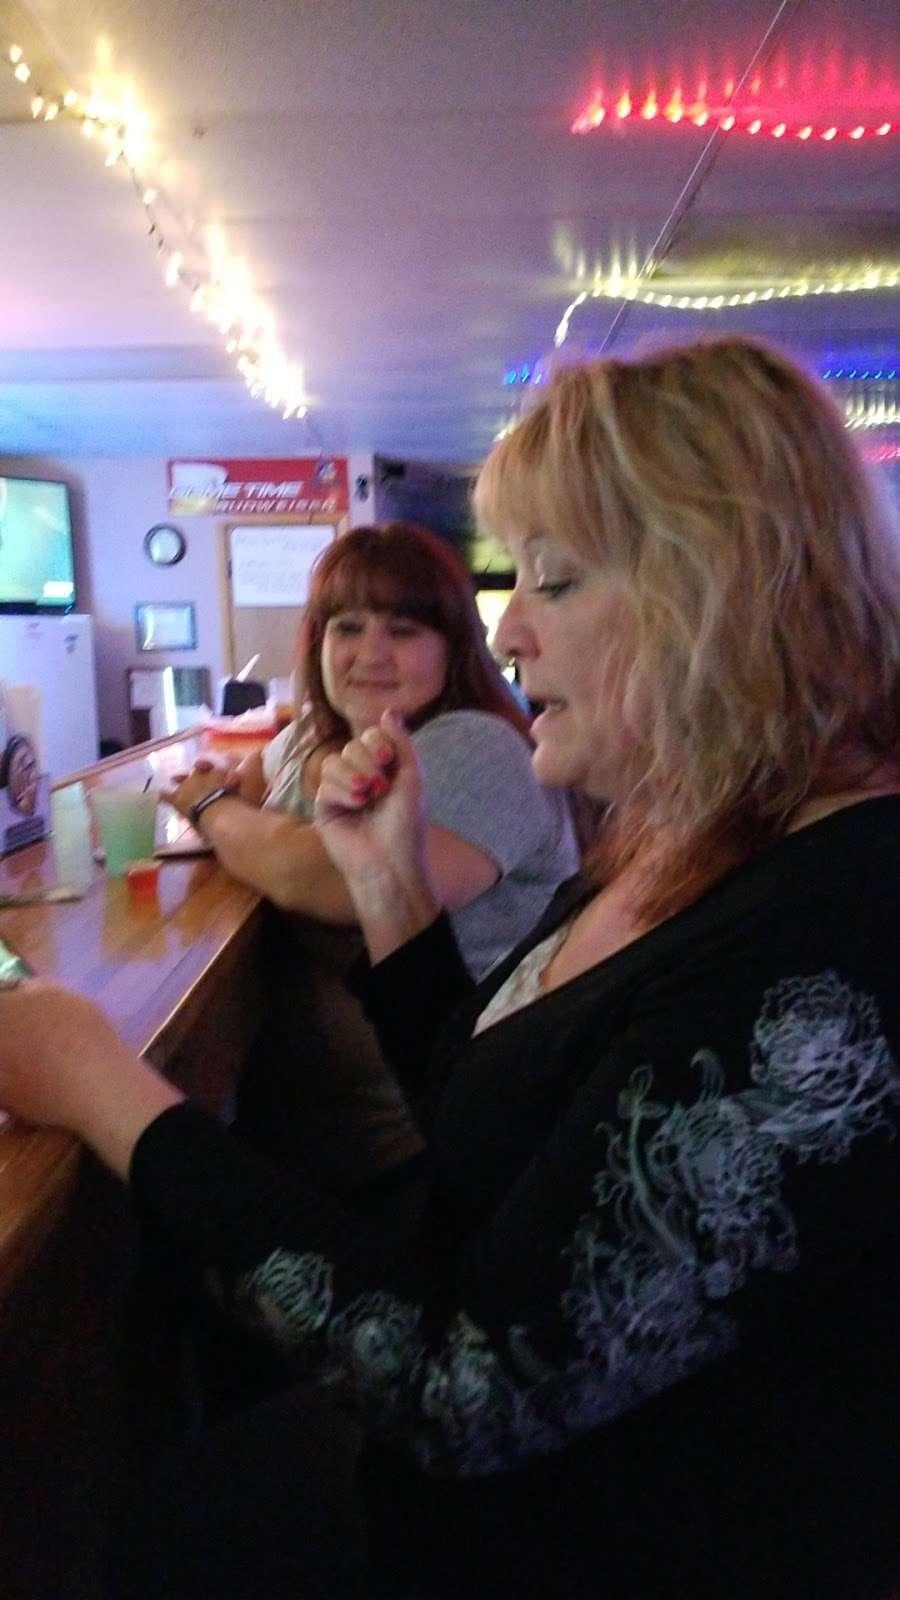 Rurys Tap - restaurant  | Photo 4 of 6 | Address: 365 Lake St, South Wilmington, IL 60474, USA | Phone: (815) 237-2756